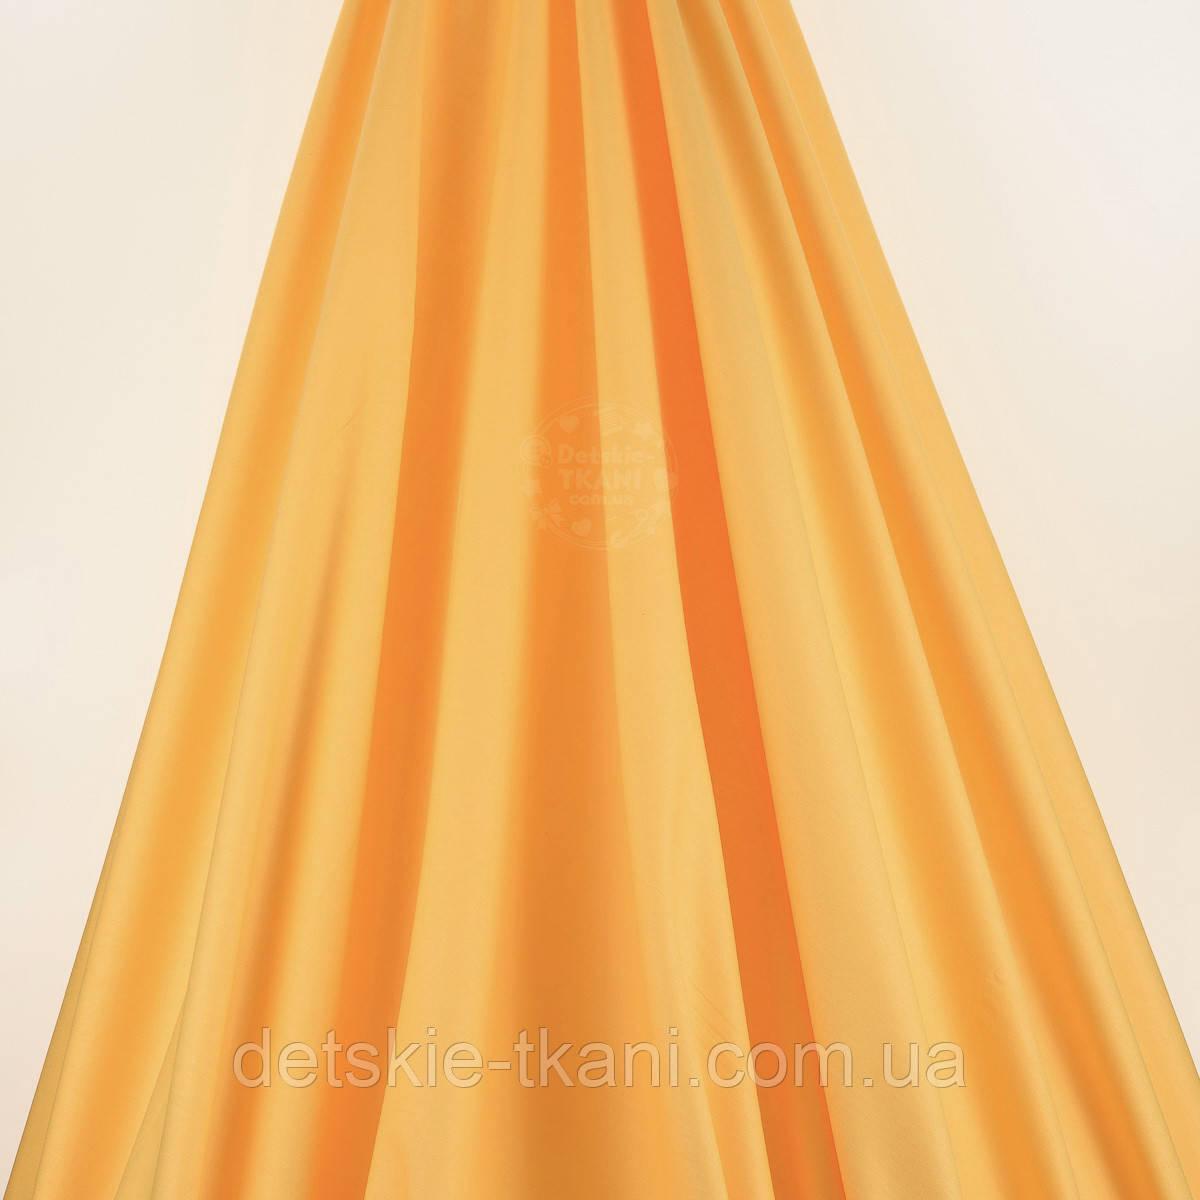 Поплин однотонный, цвет жёлто-оранжевый (№ 1363)